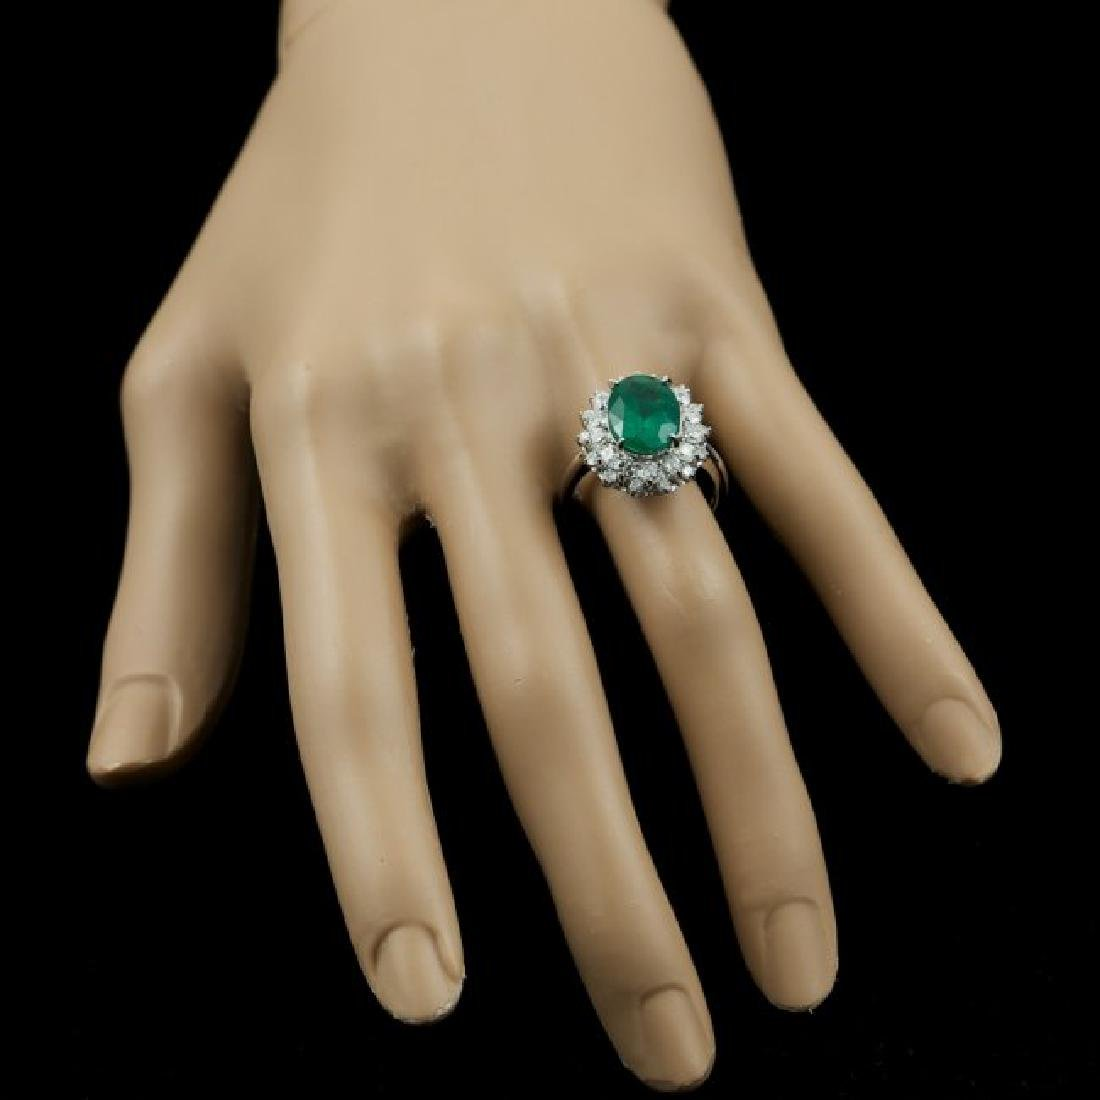 14k White Gold 3.50ct Emerald 1.55ct Diamond Ring - 6